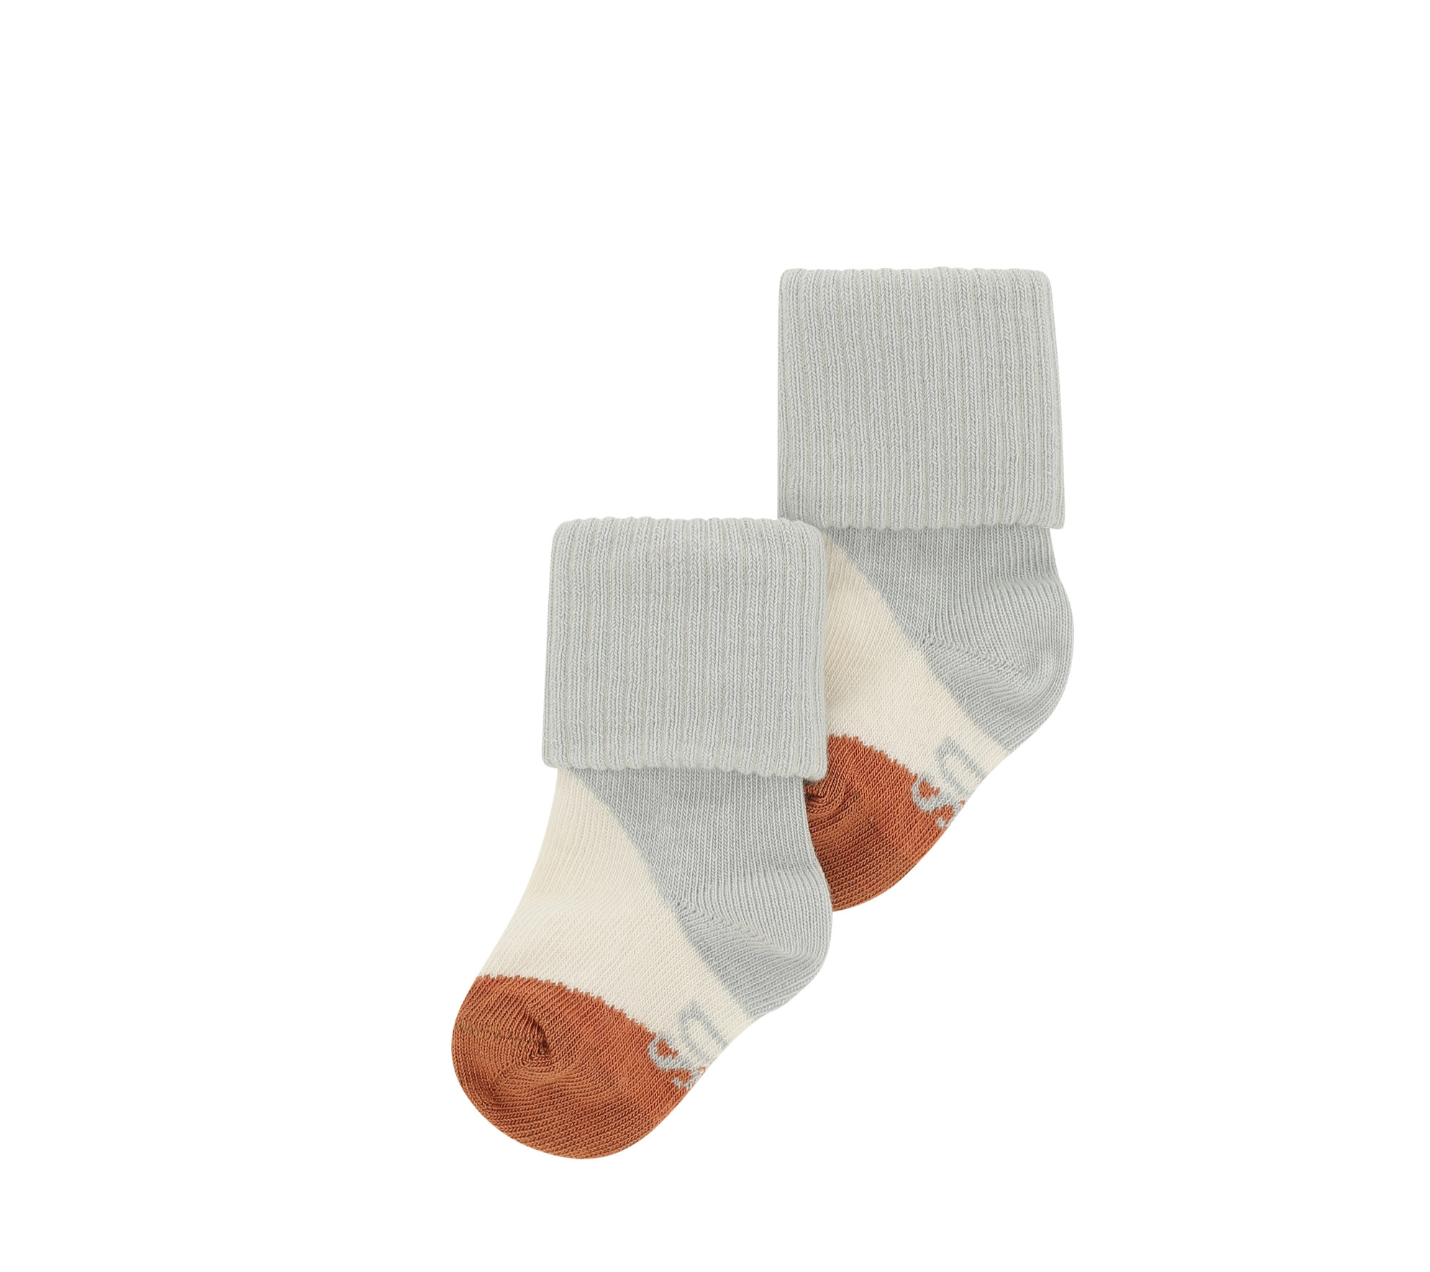 Kopie von Soft Gallery Baby Girl Socks Pale Mauve Stripes